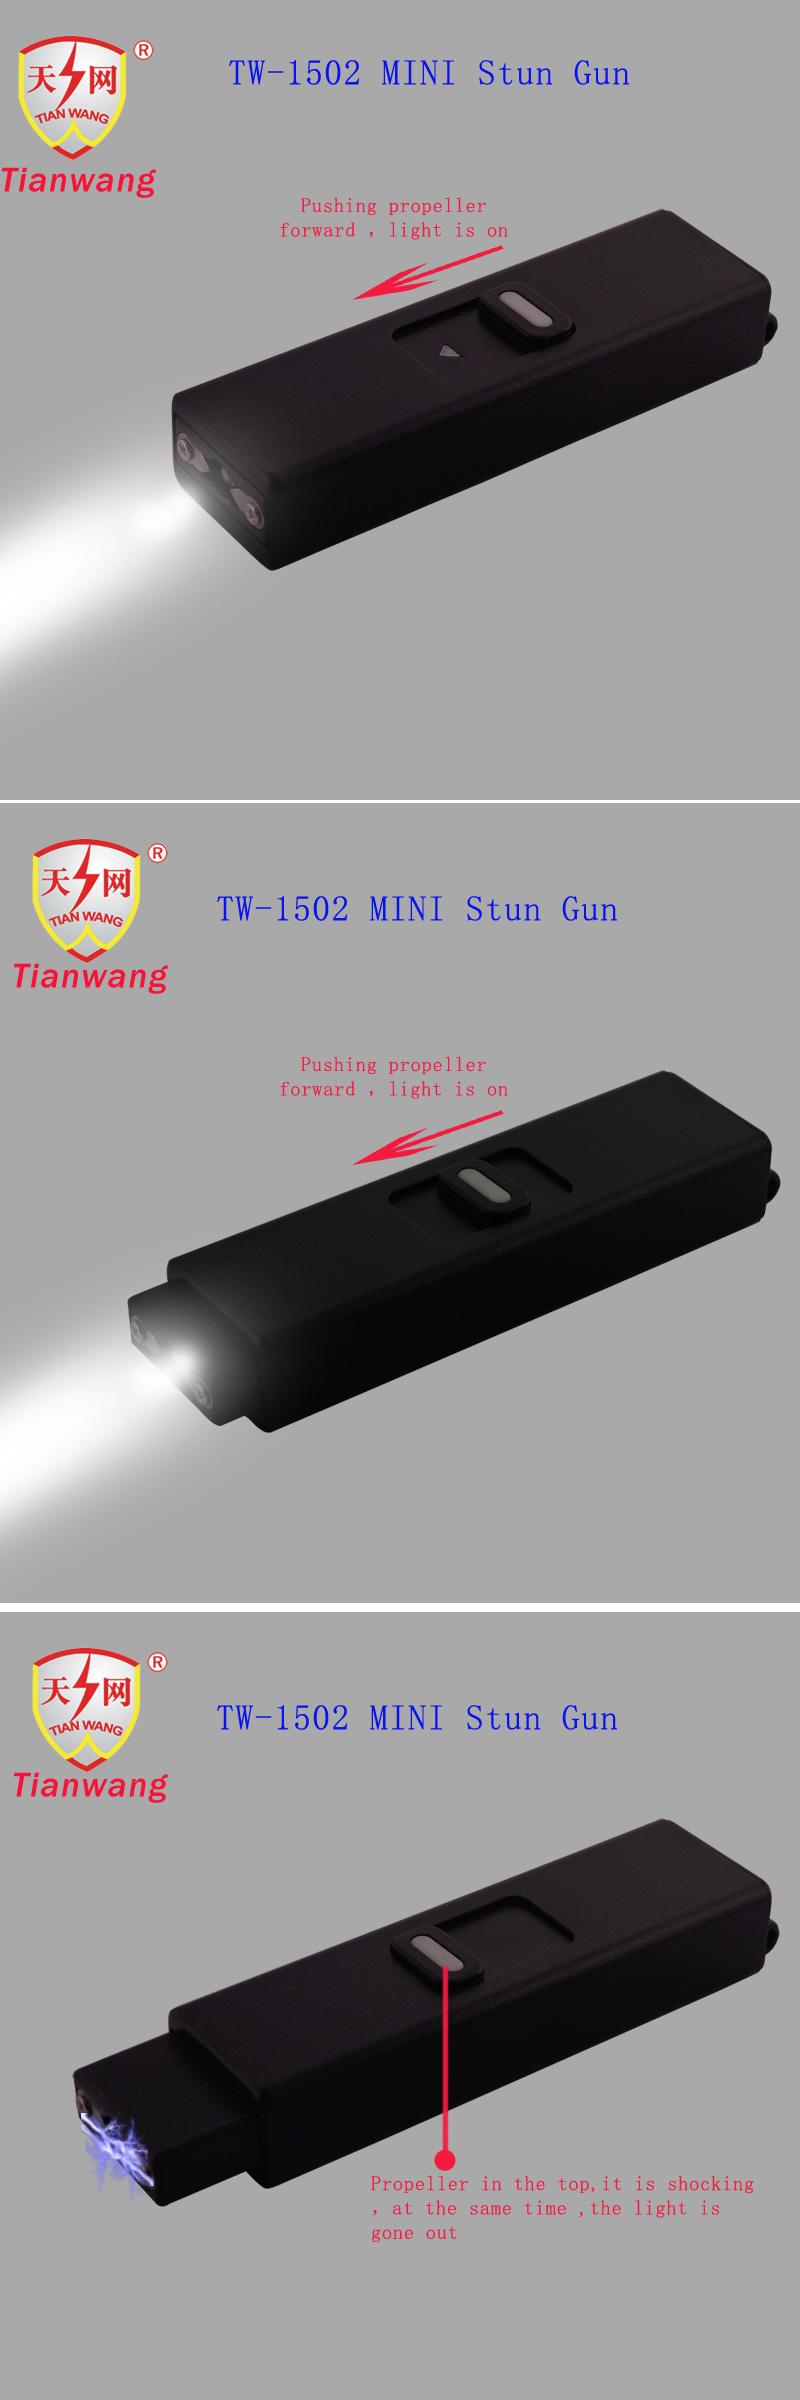 2016 Hot Sales Mini Flashlight with Stun Gun